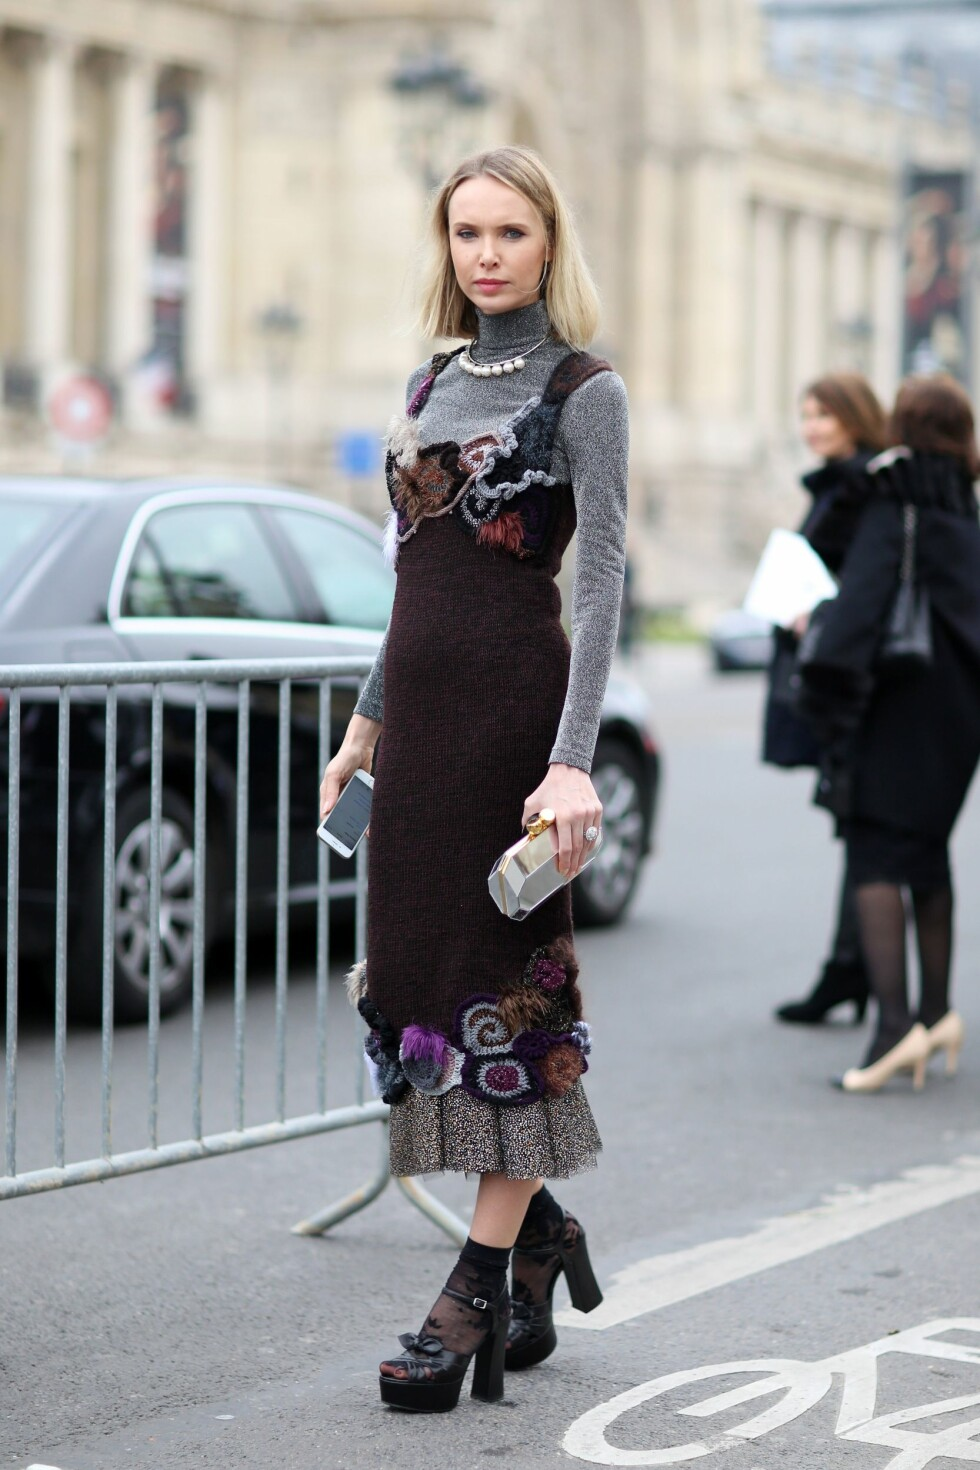 Blondesokker er også en trend blant fashionistaene.  Foto: All Over